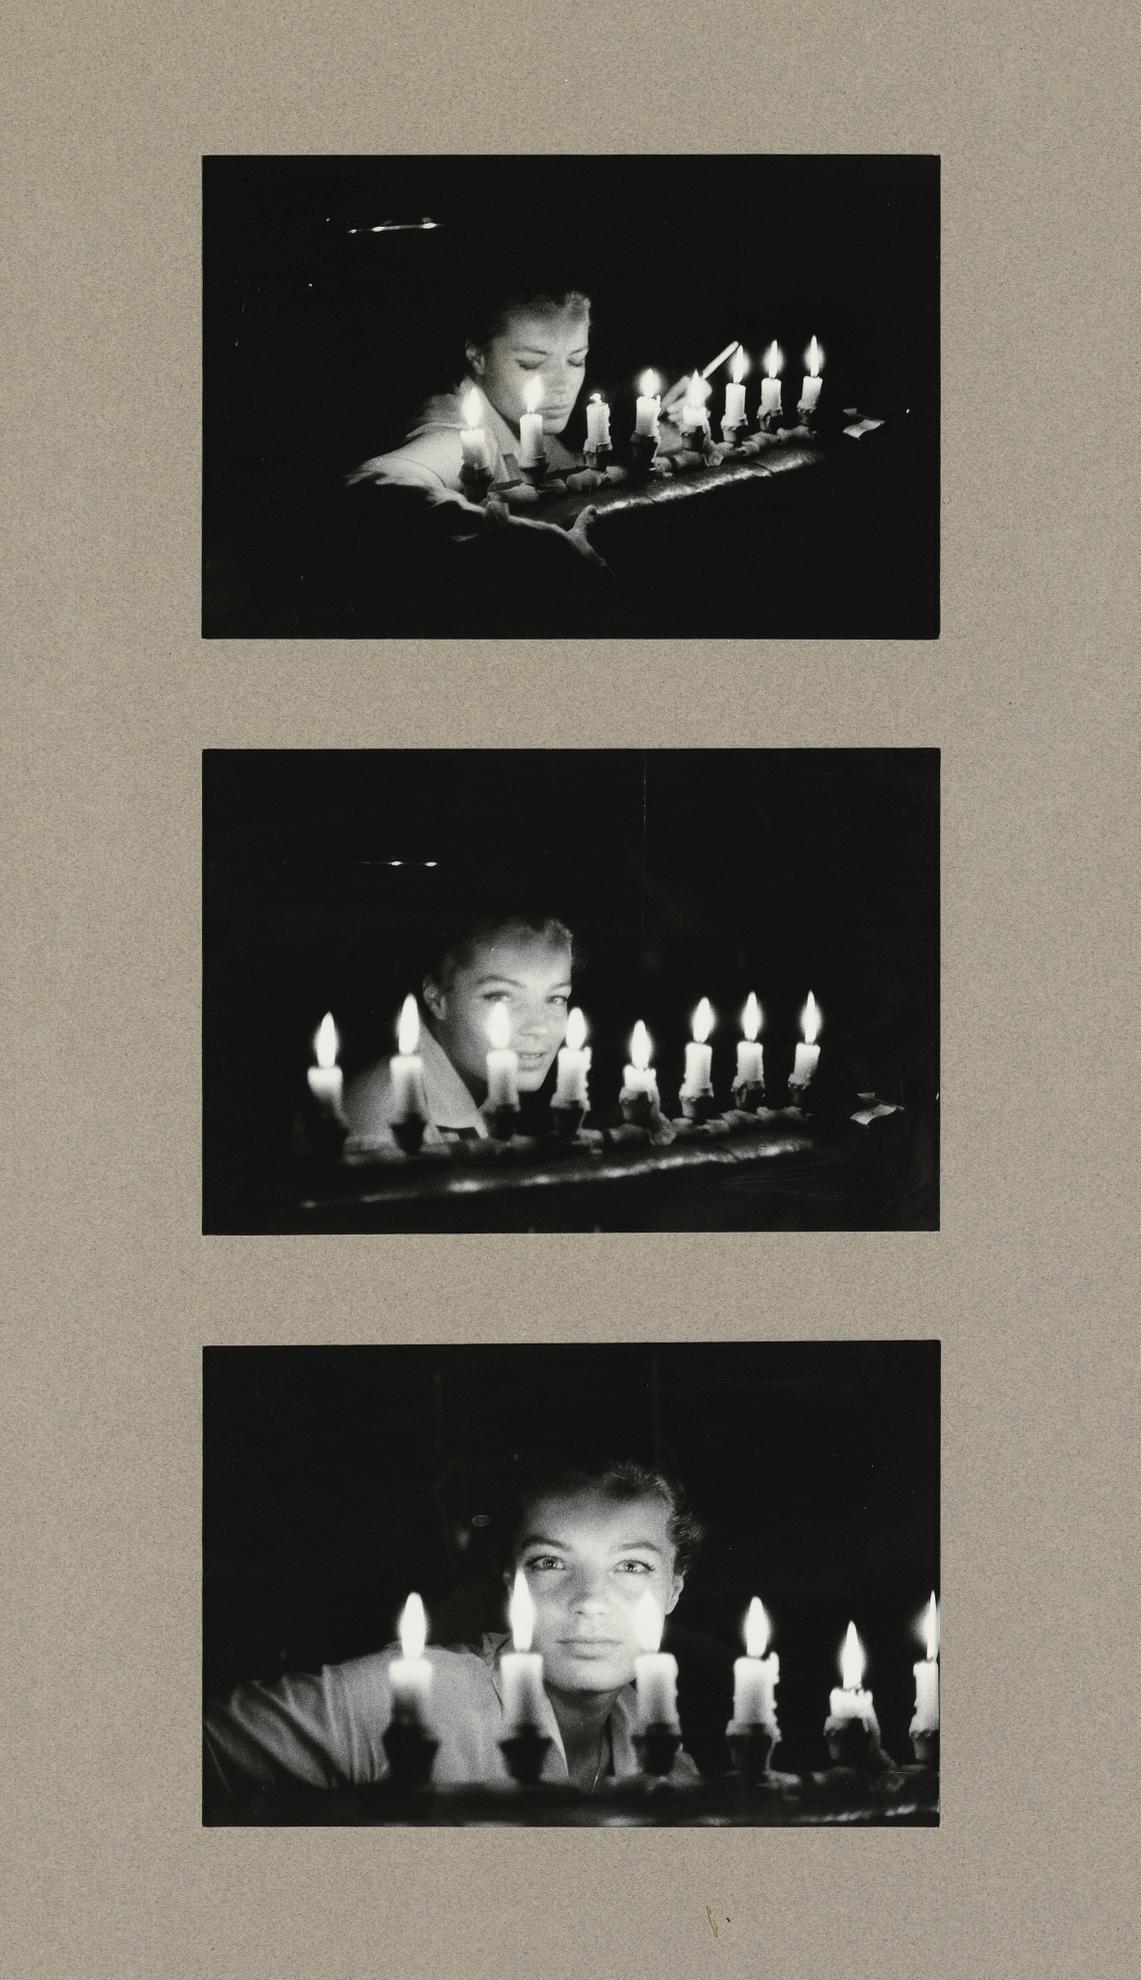 Milton H. Greene-Romy Schneider-1960